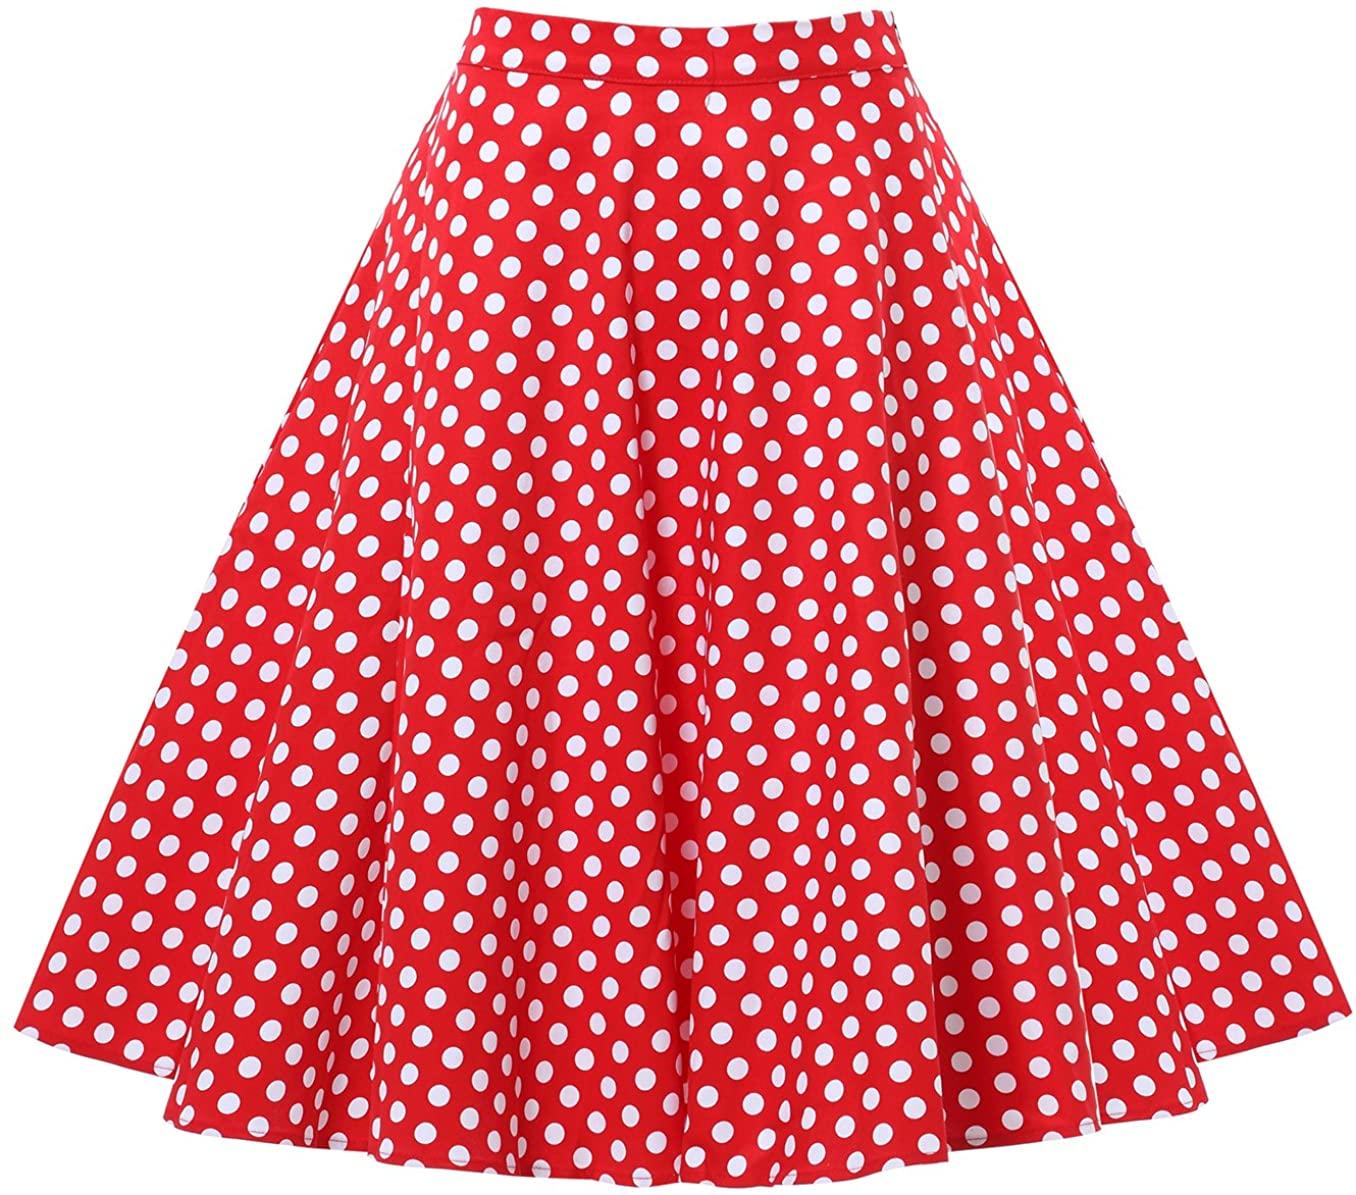 Laorchid 50s Women's Pleated Skirt Swing Inspired Skirts Polka Dot Rockabilly